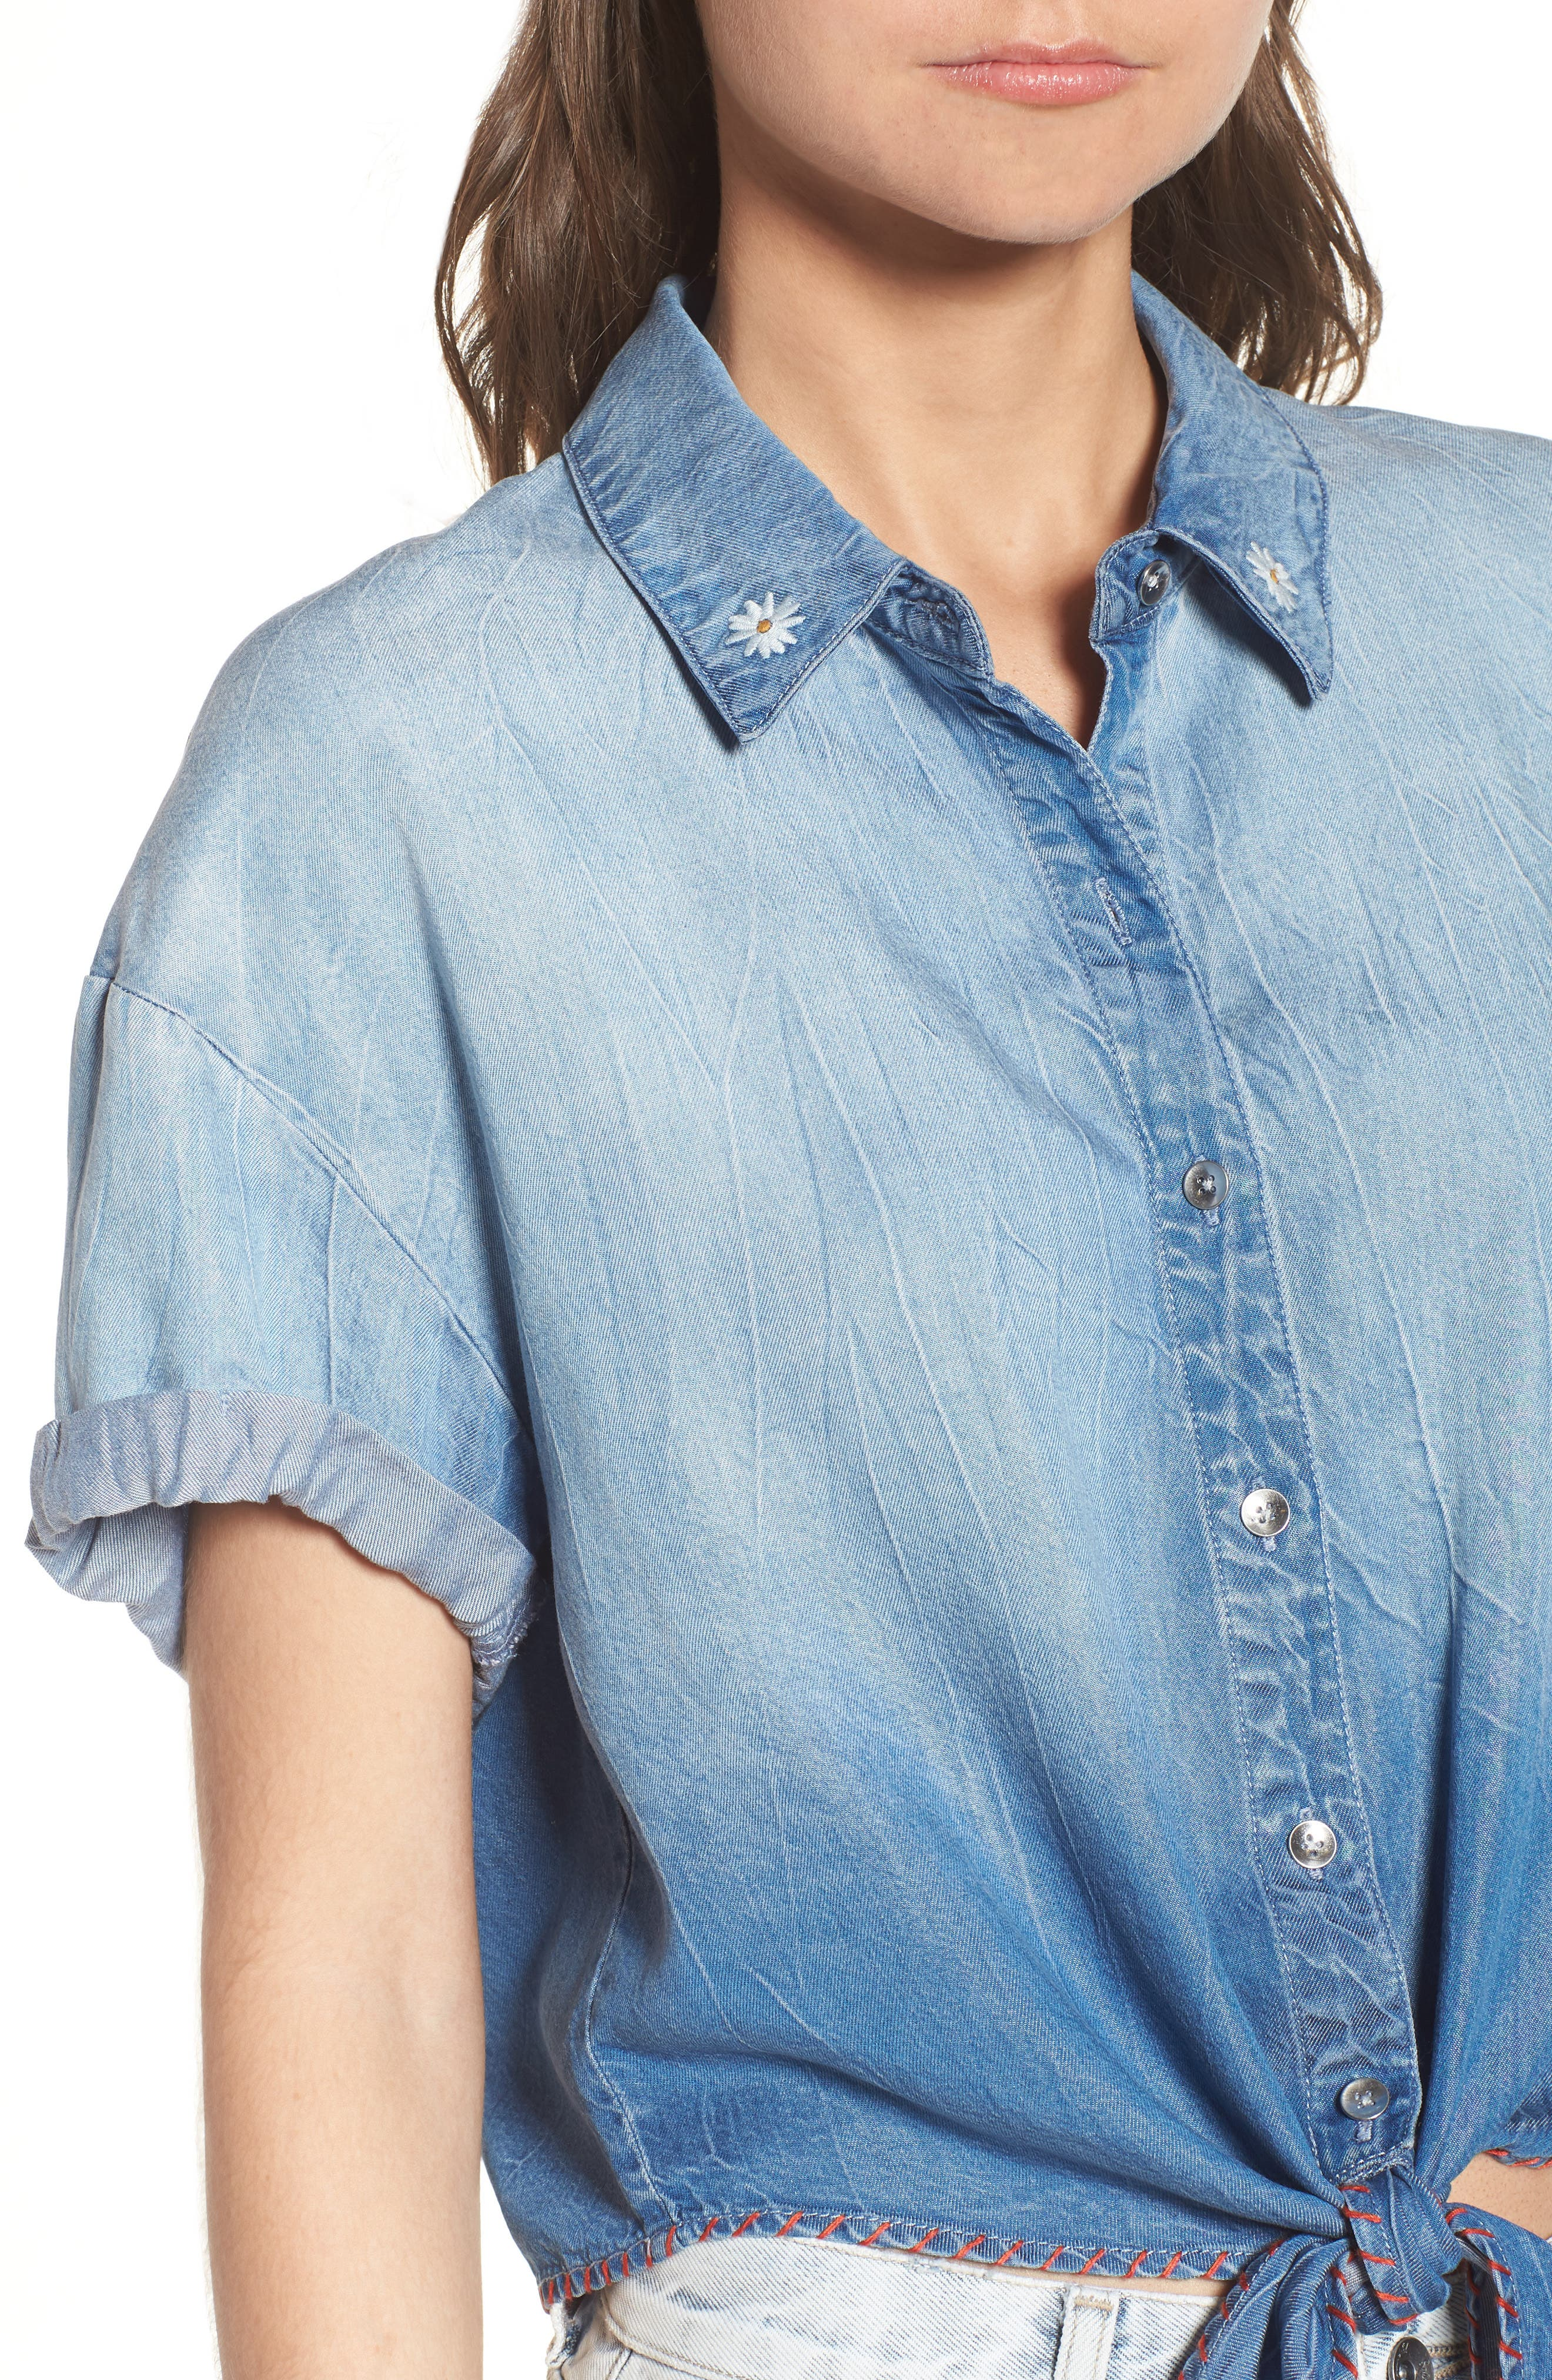 x Margherita Roma Indigo Shirt,                             Alternate thumbnail 4, color,                             Cielo Wash